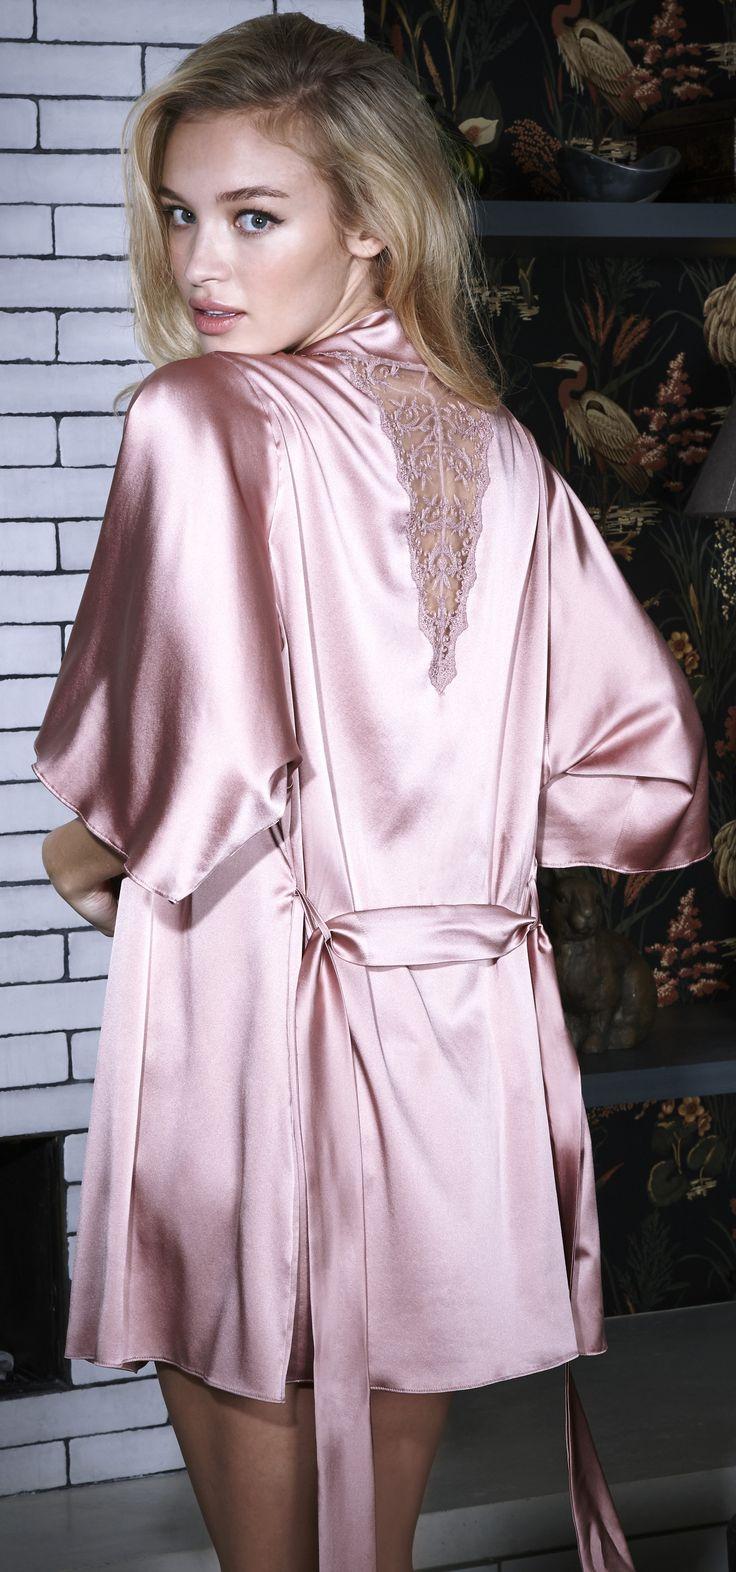 Need✨ M/L https://www.fleurofengland.com/lingerie/collections/sofia/sofia-silk-robe